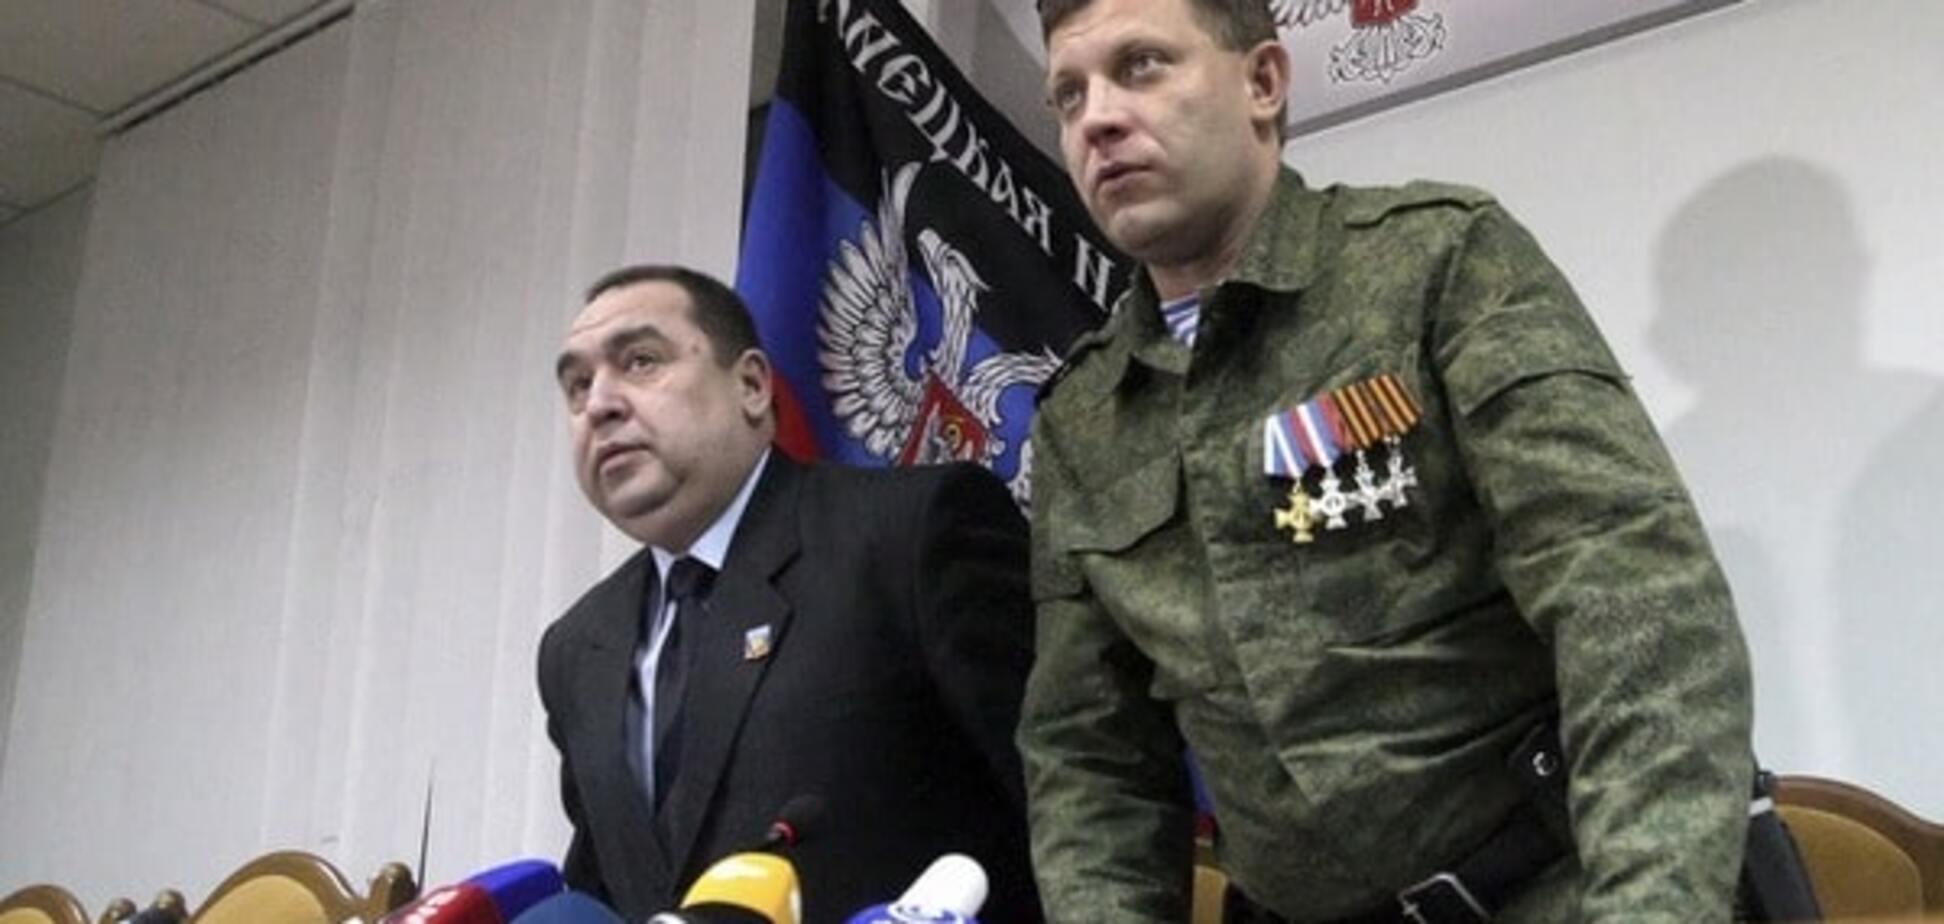 Игорь Плотницкий, Александр Захарченко